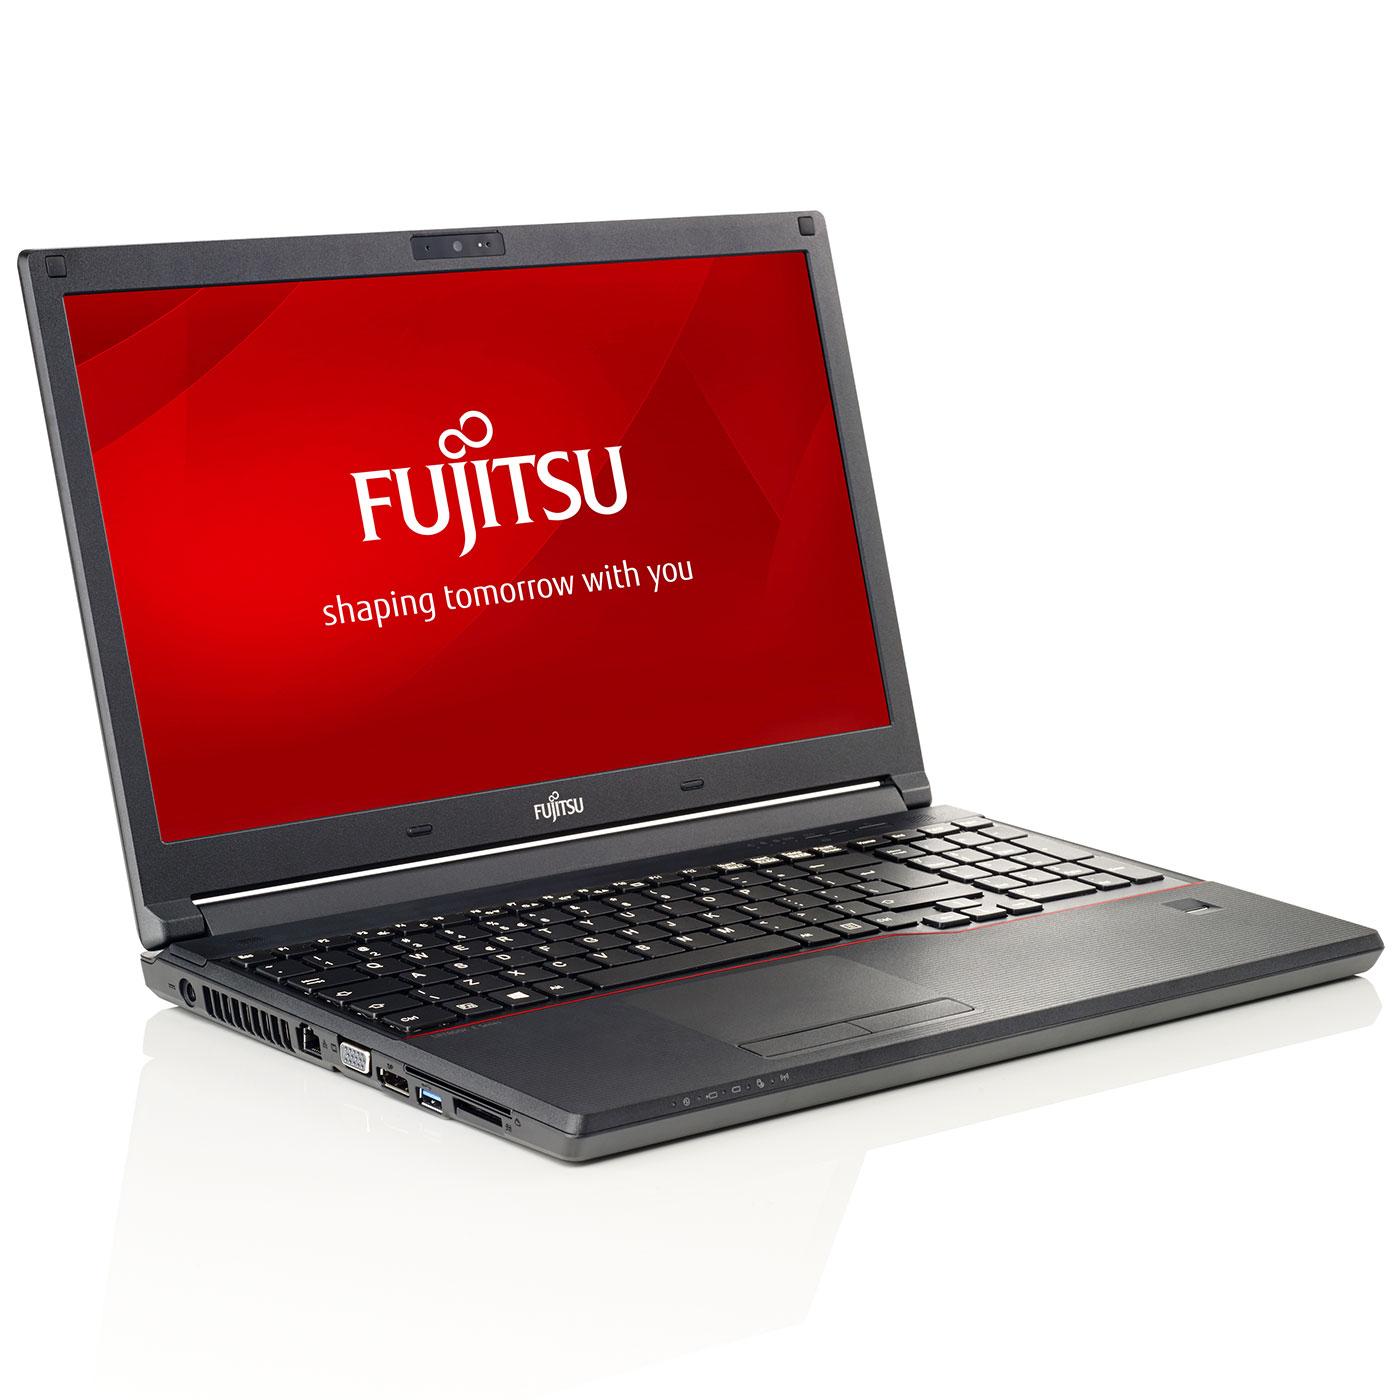 fujitsu lifebook e554 vfy e5540m33a1fr pc portable. Black Bedroom Furniture Sets. Home Design Ideas